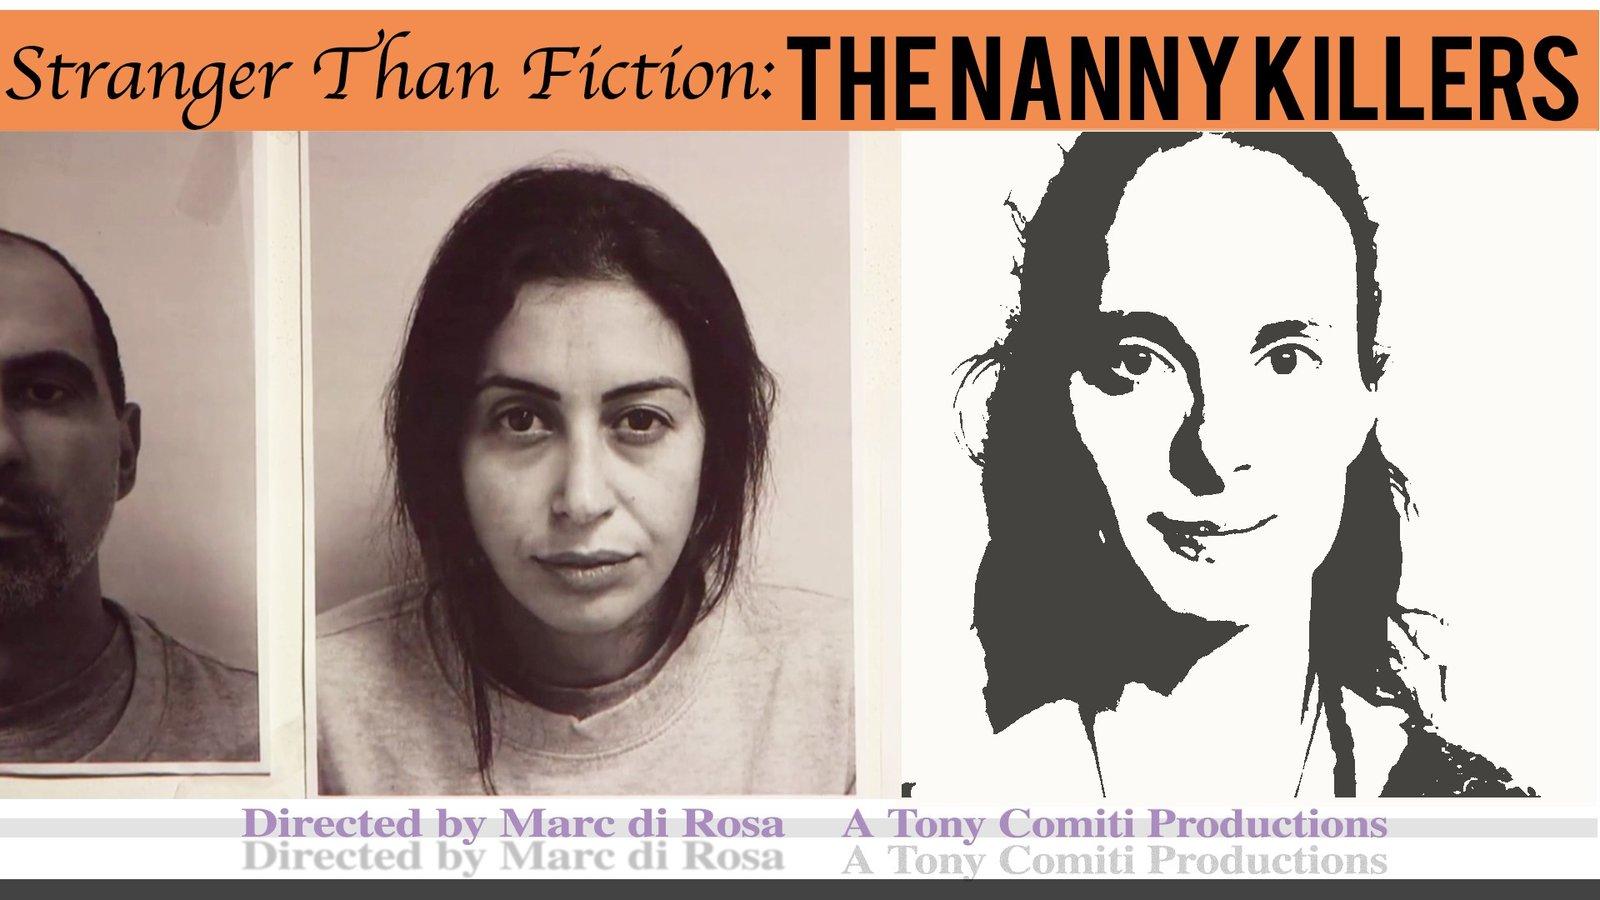 Stranger Than Fiction - The Nanny Killers